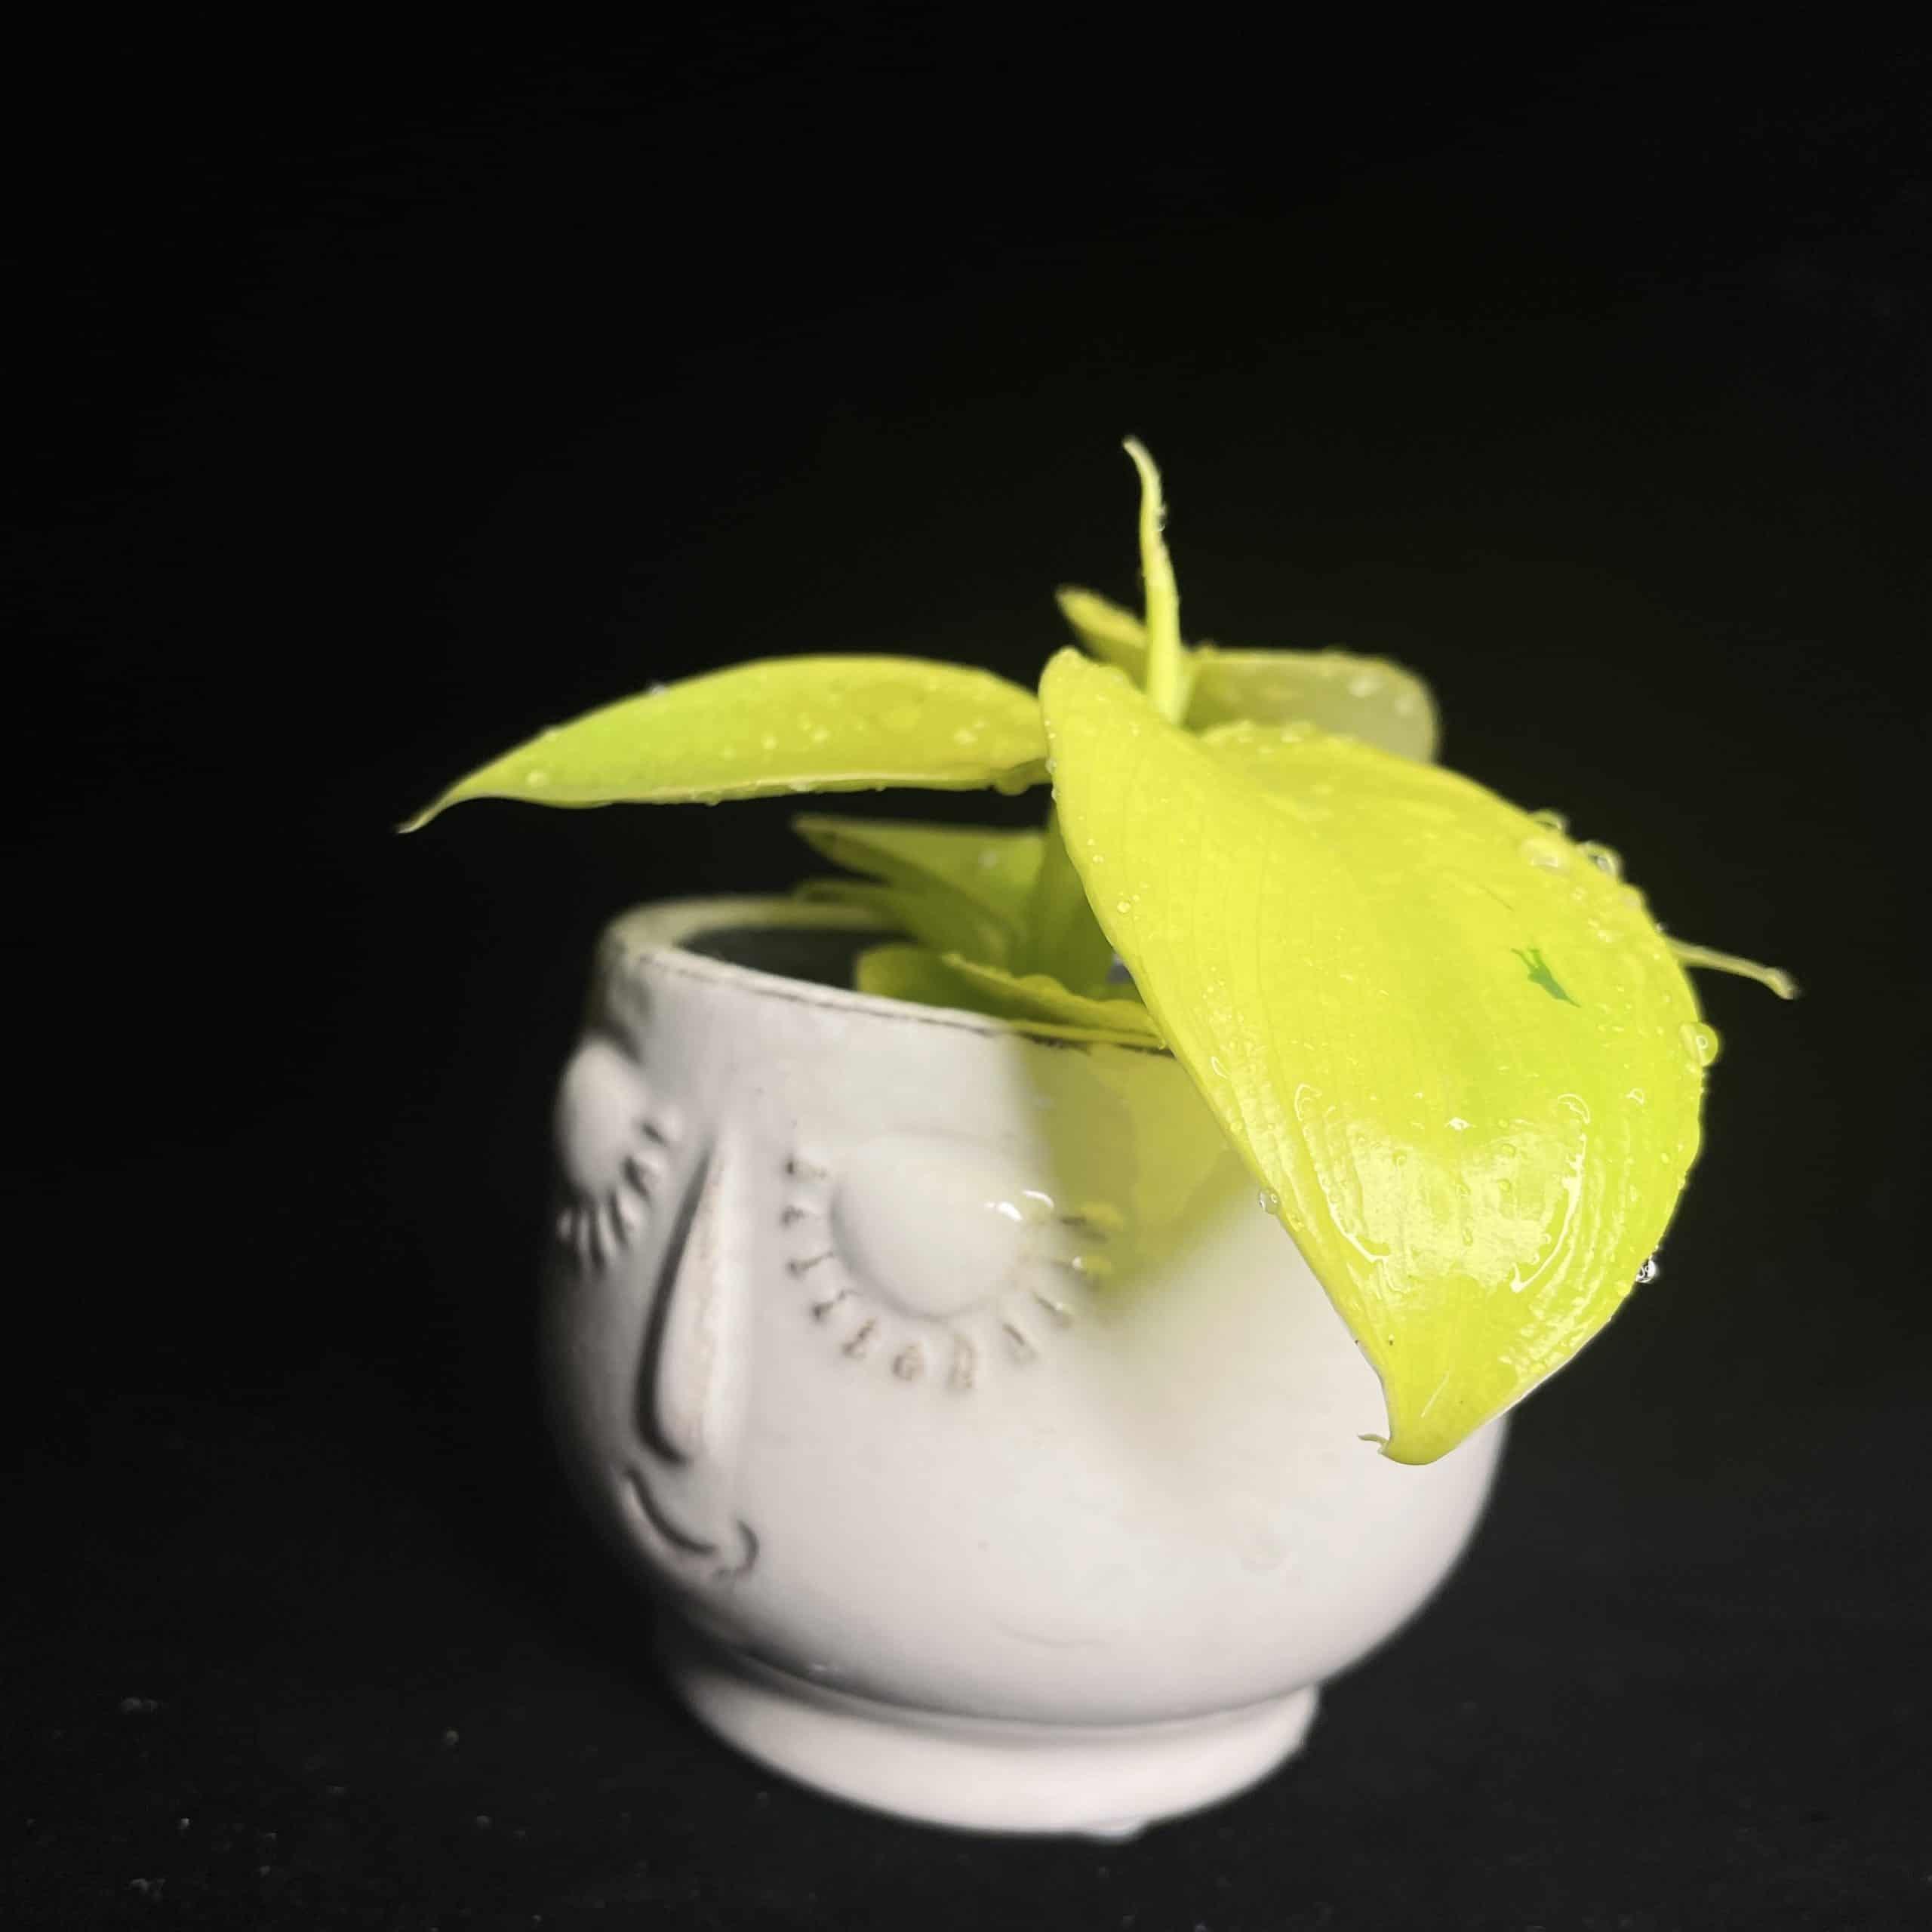 Philodendron Moonlight Lemon Lime in 6cm pot